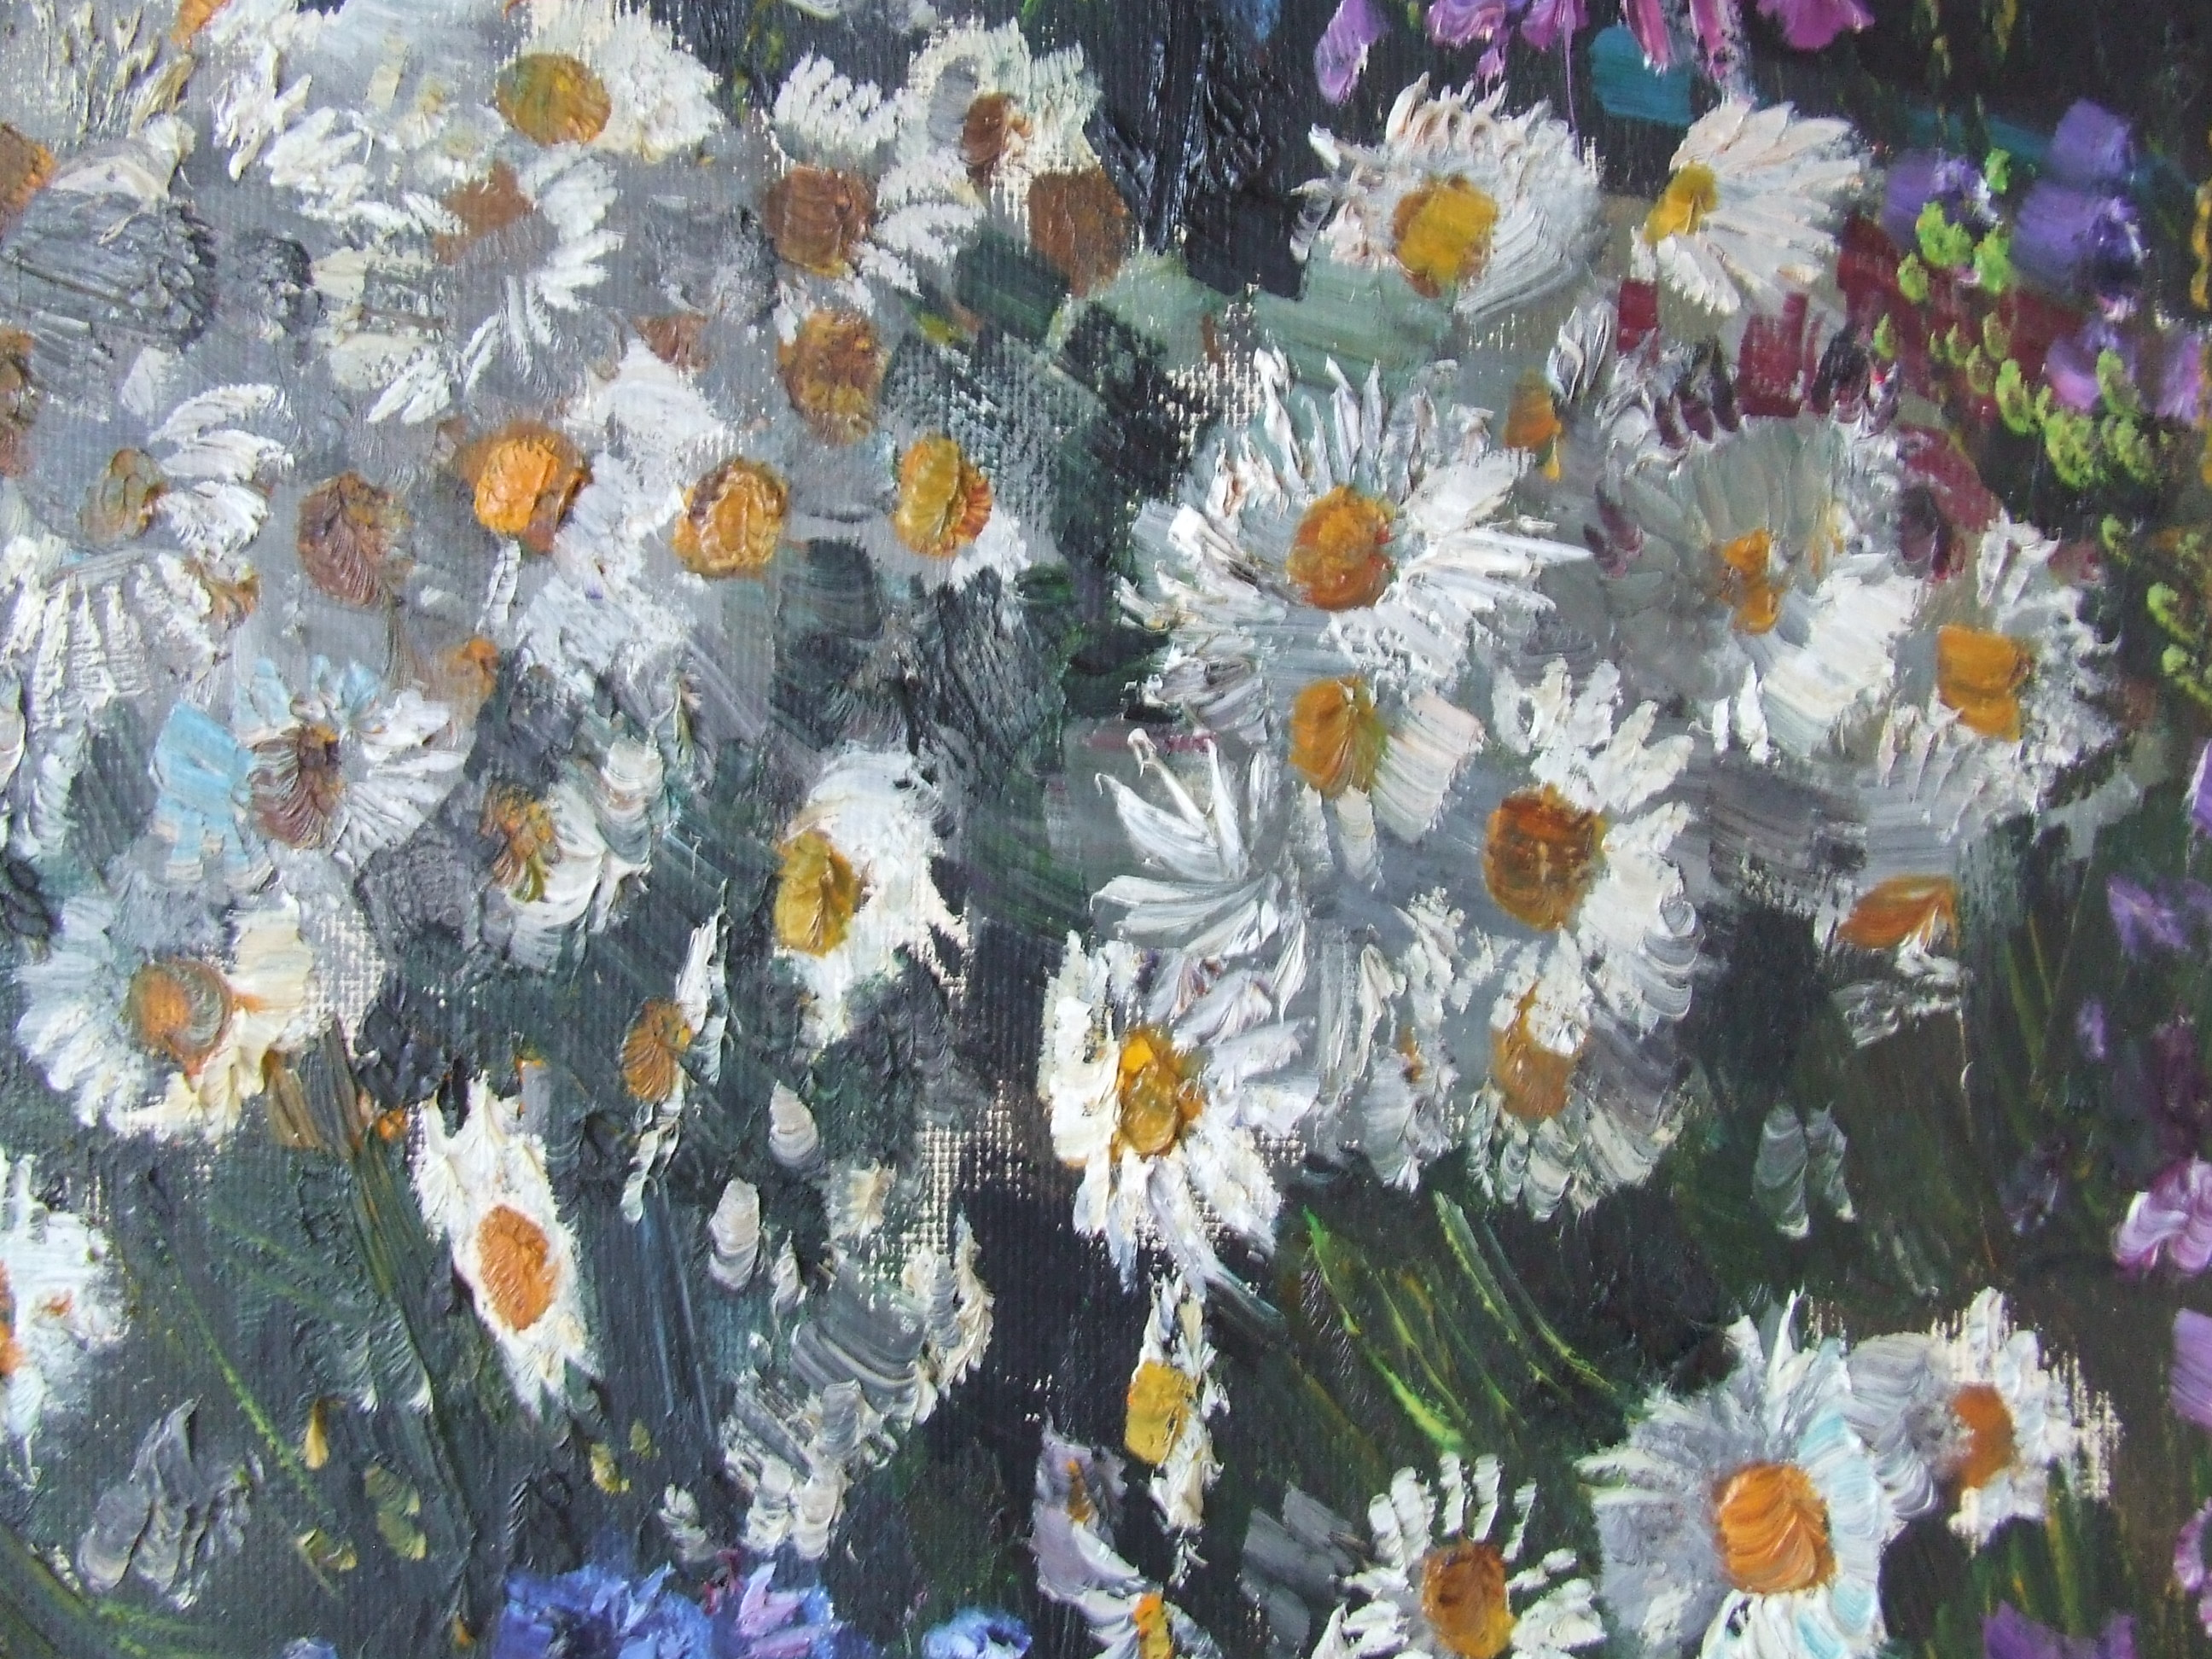 Натюрморт ваза с цветами 70-80 см., холст, масло 1981 год  - 1